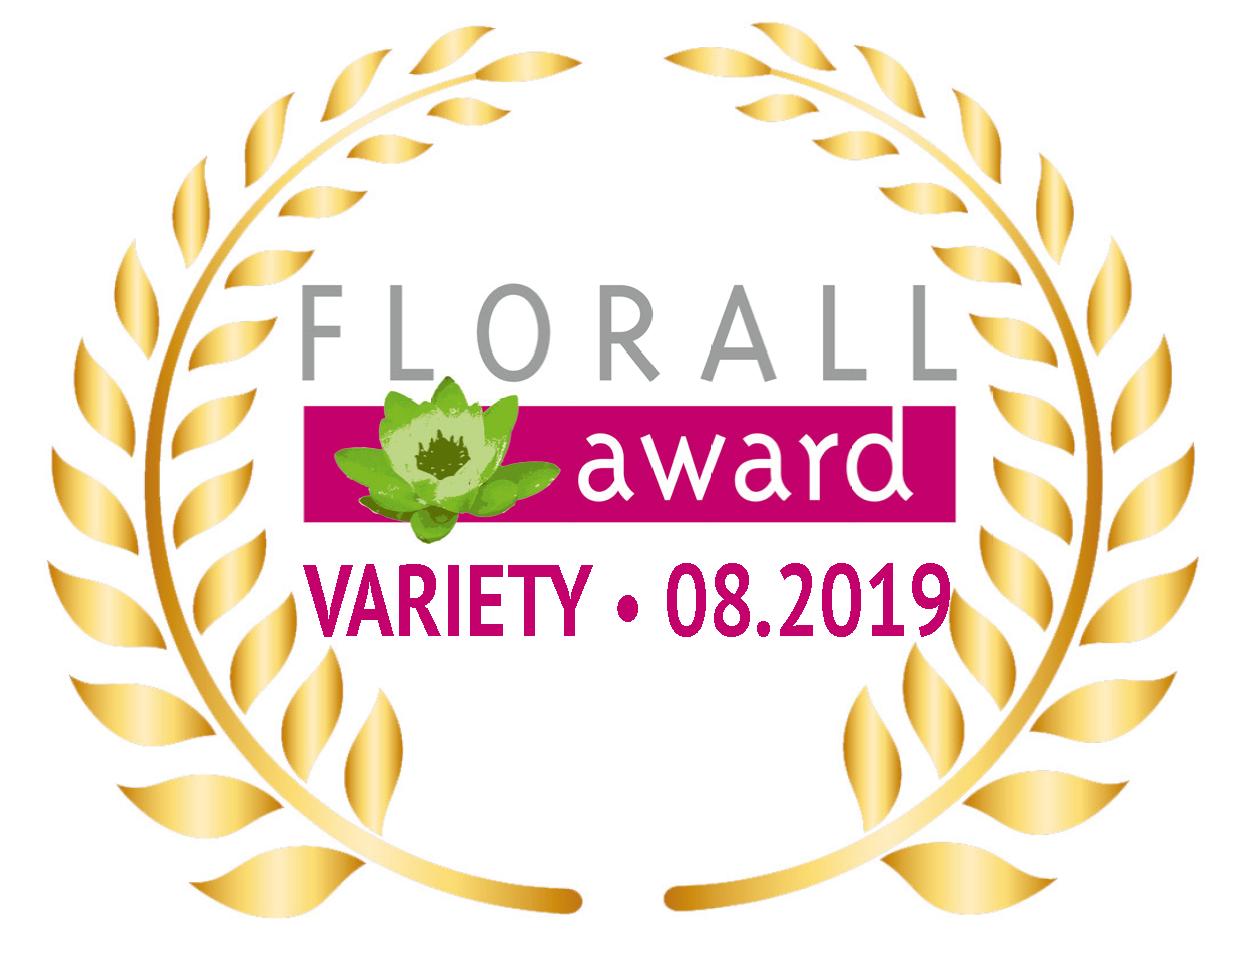 Floral Award 2019